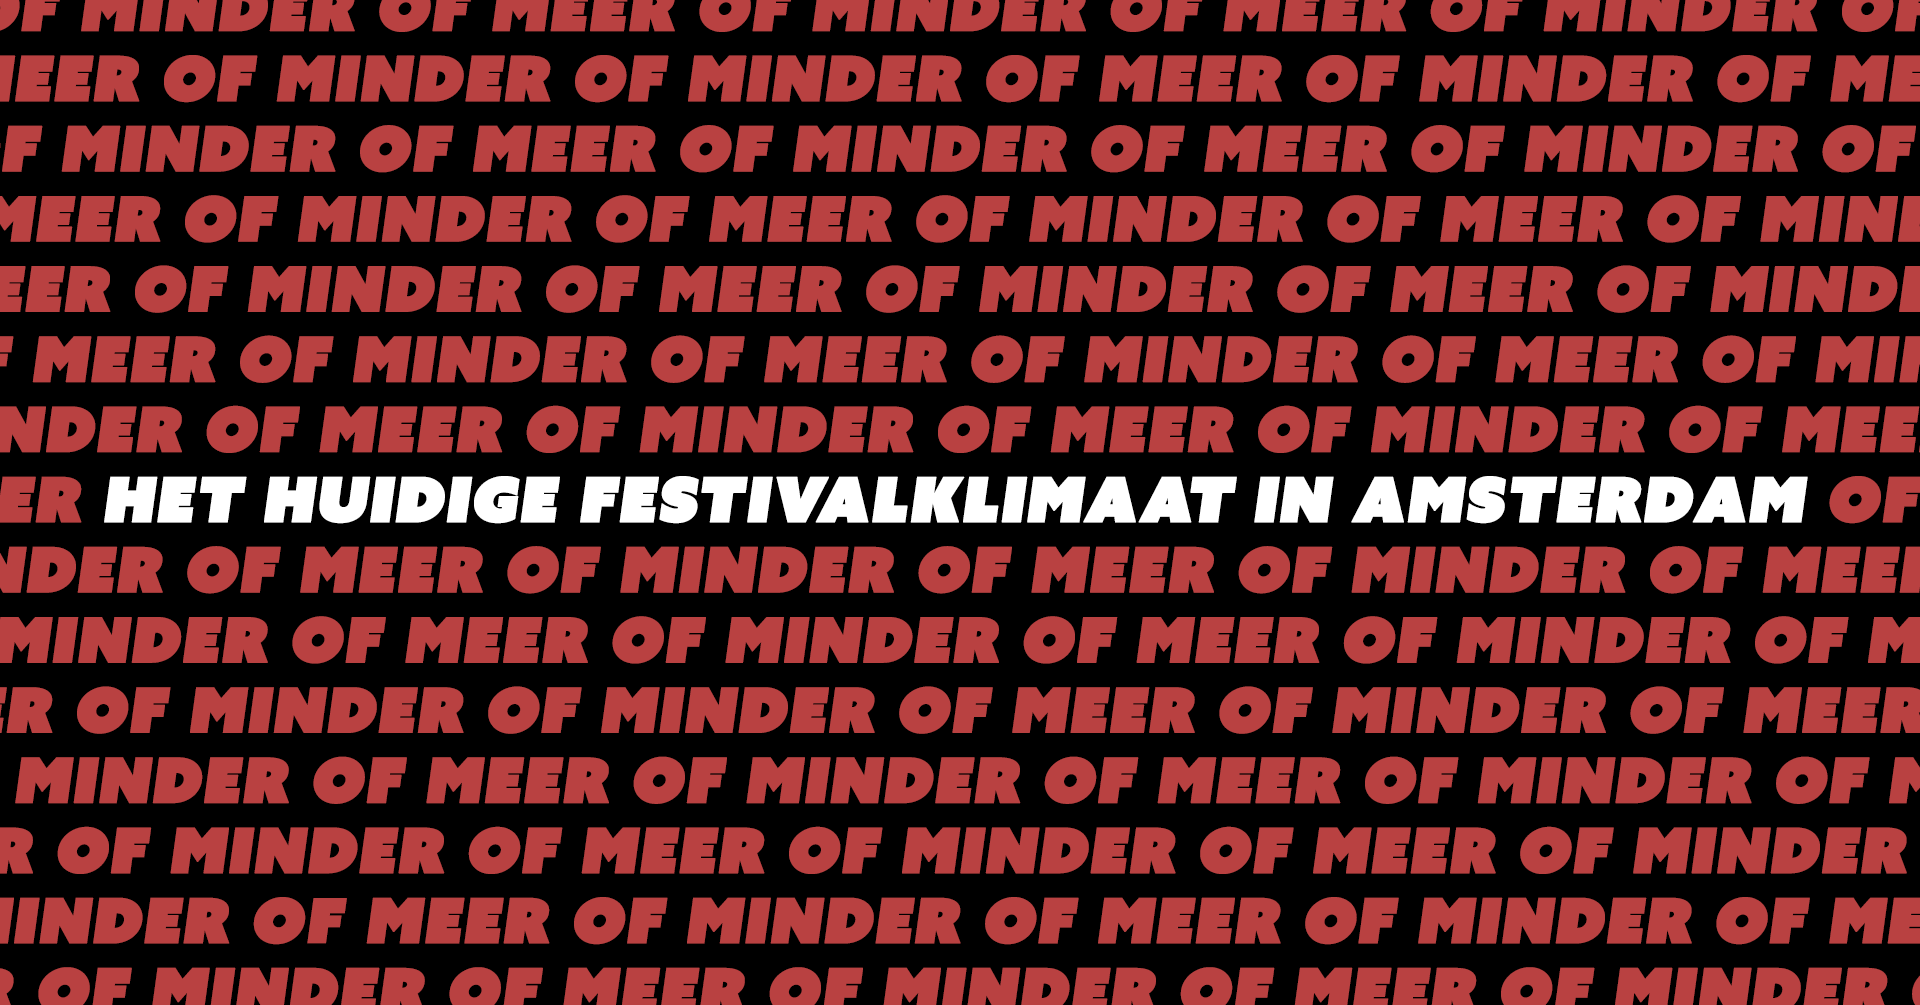 huidige-festivalklimaat-in-amsterdam